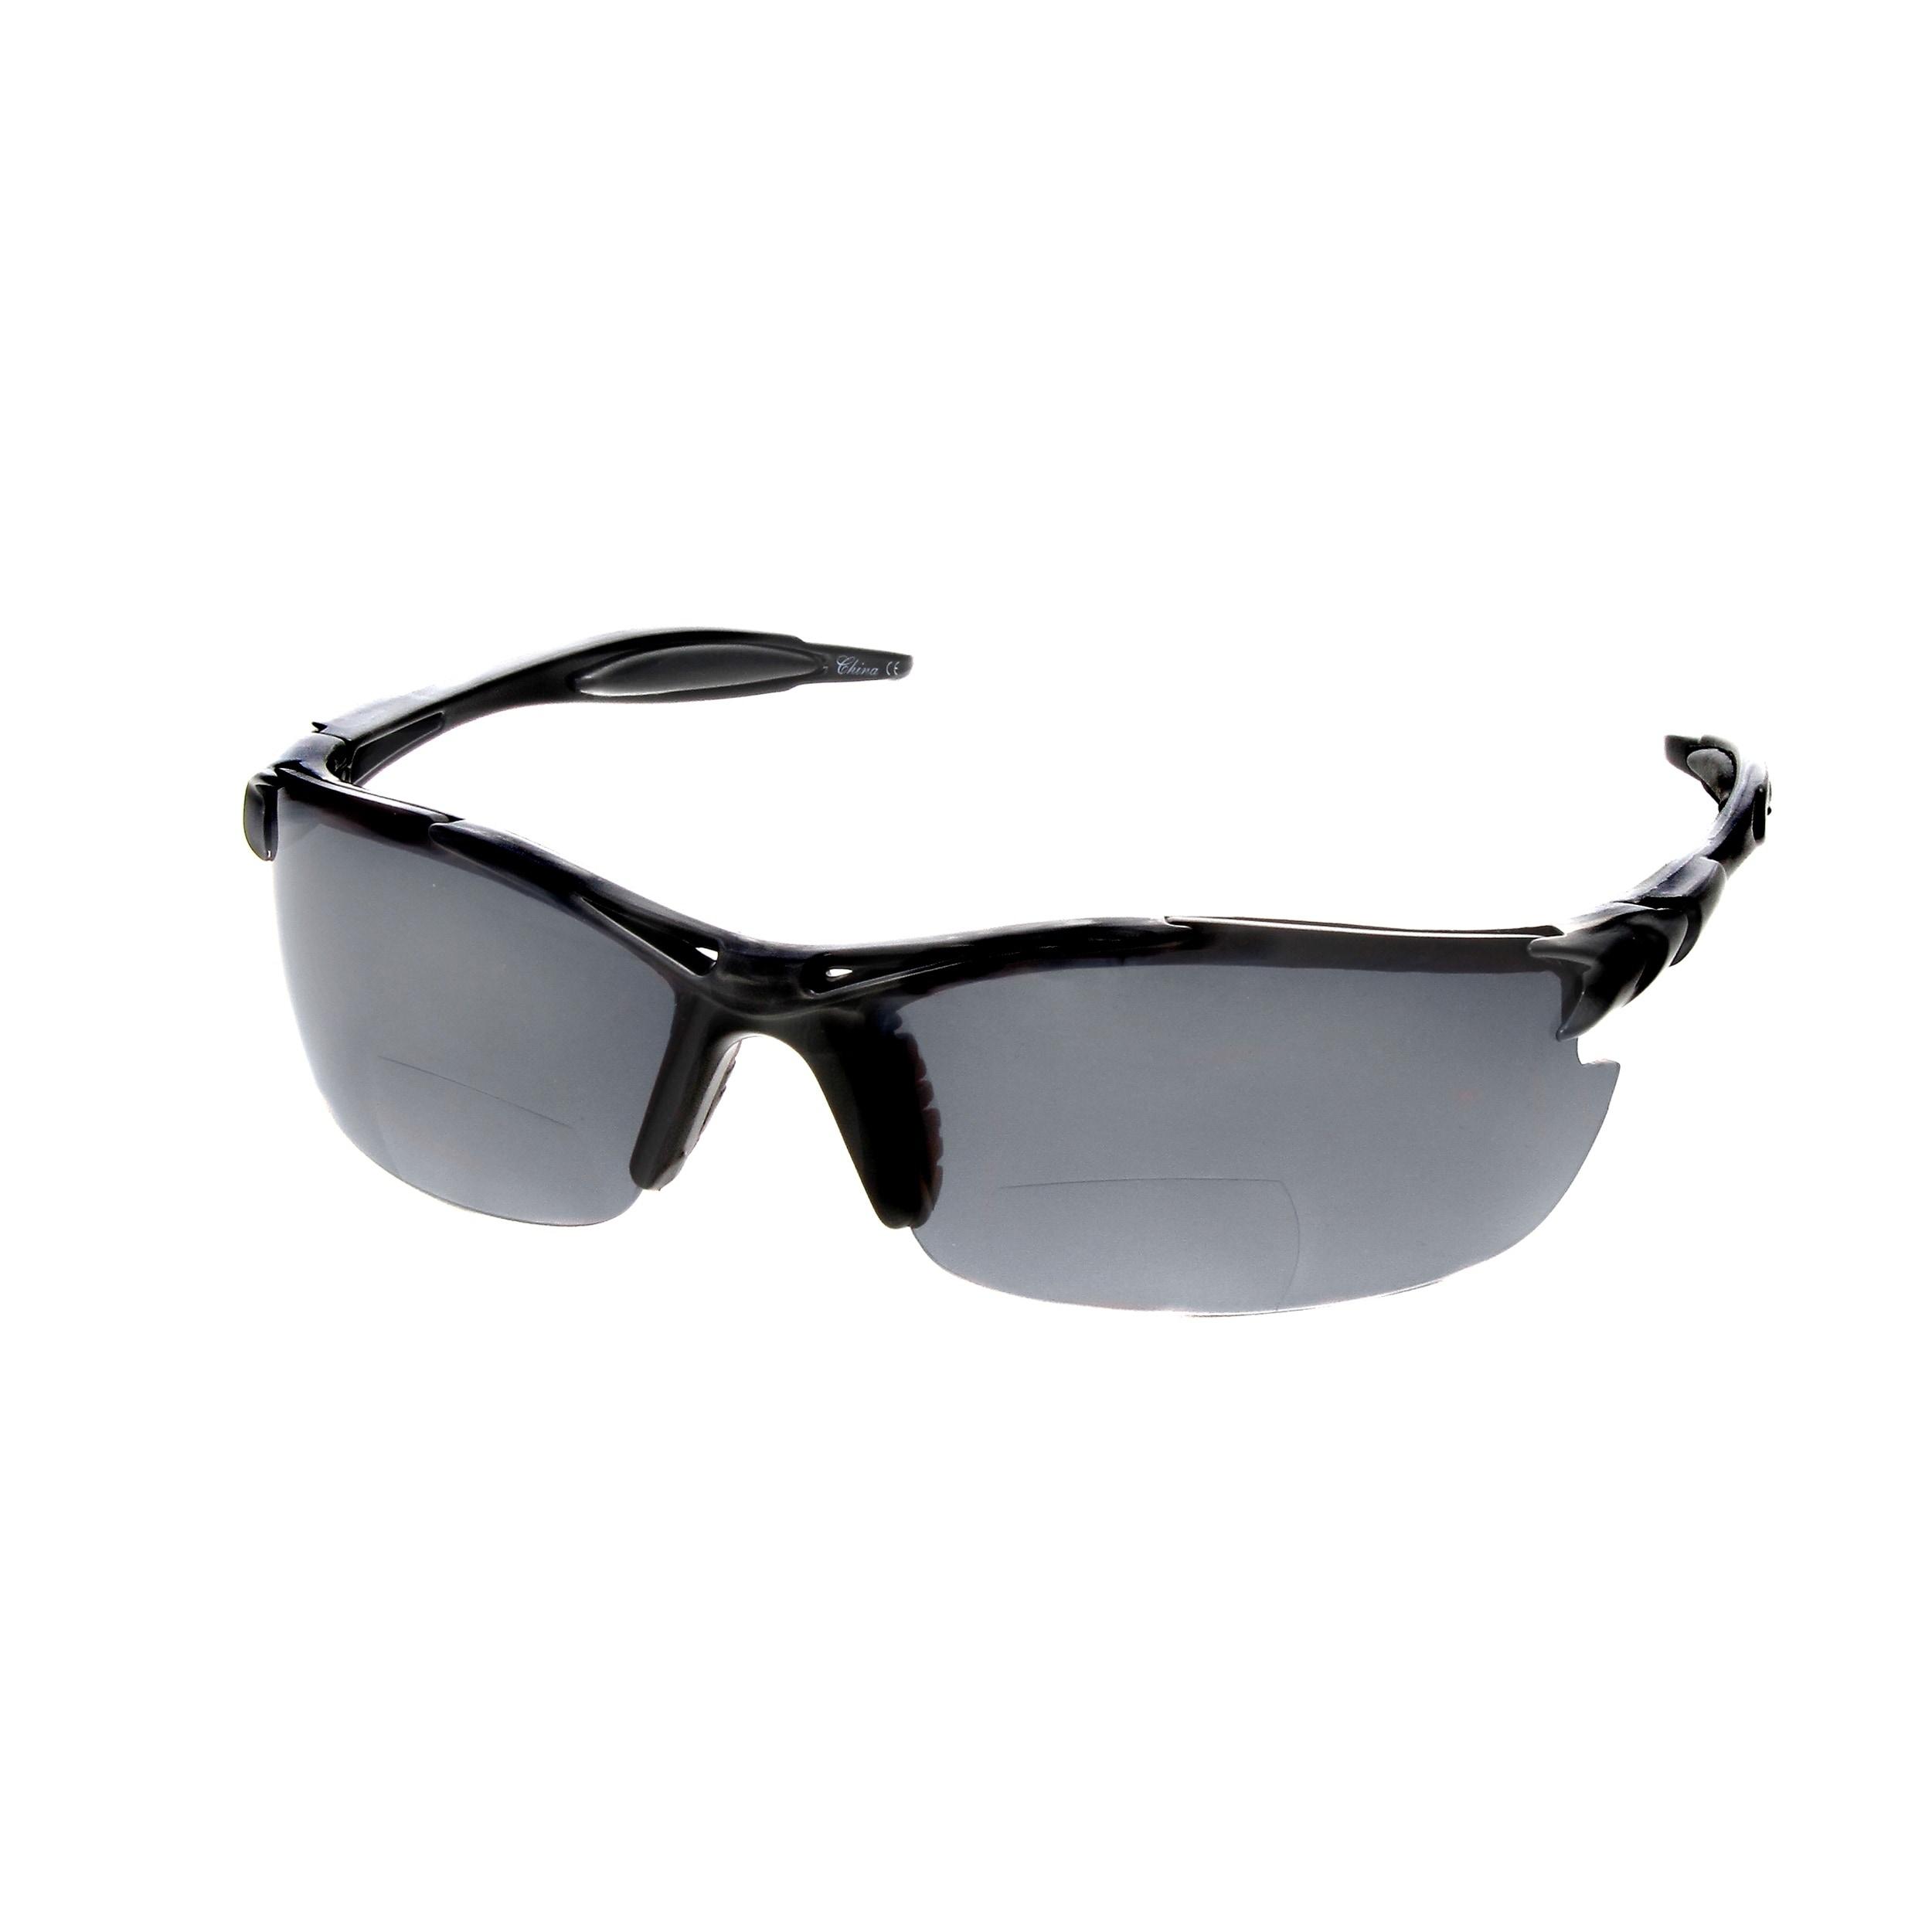 73ae692f5a Shop Hot Optix Men s Sport Wrap Sunglass Readers - Free Shipping On ...